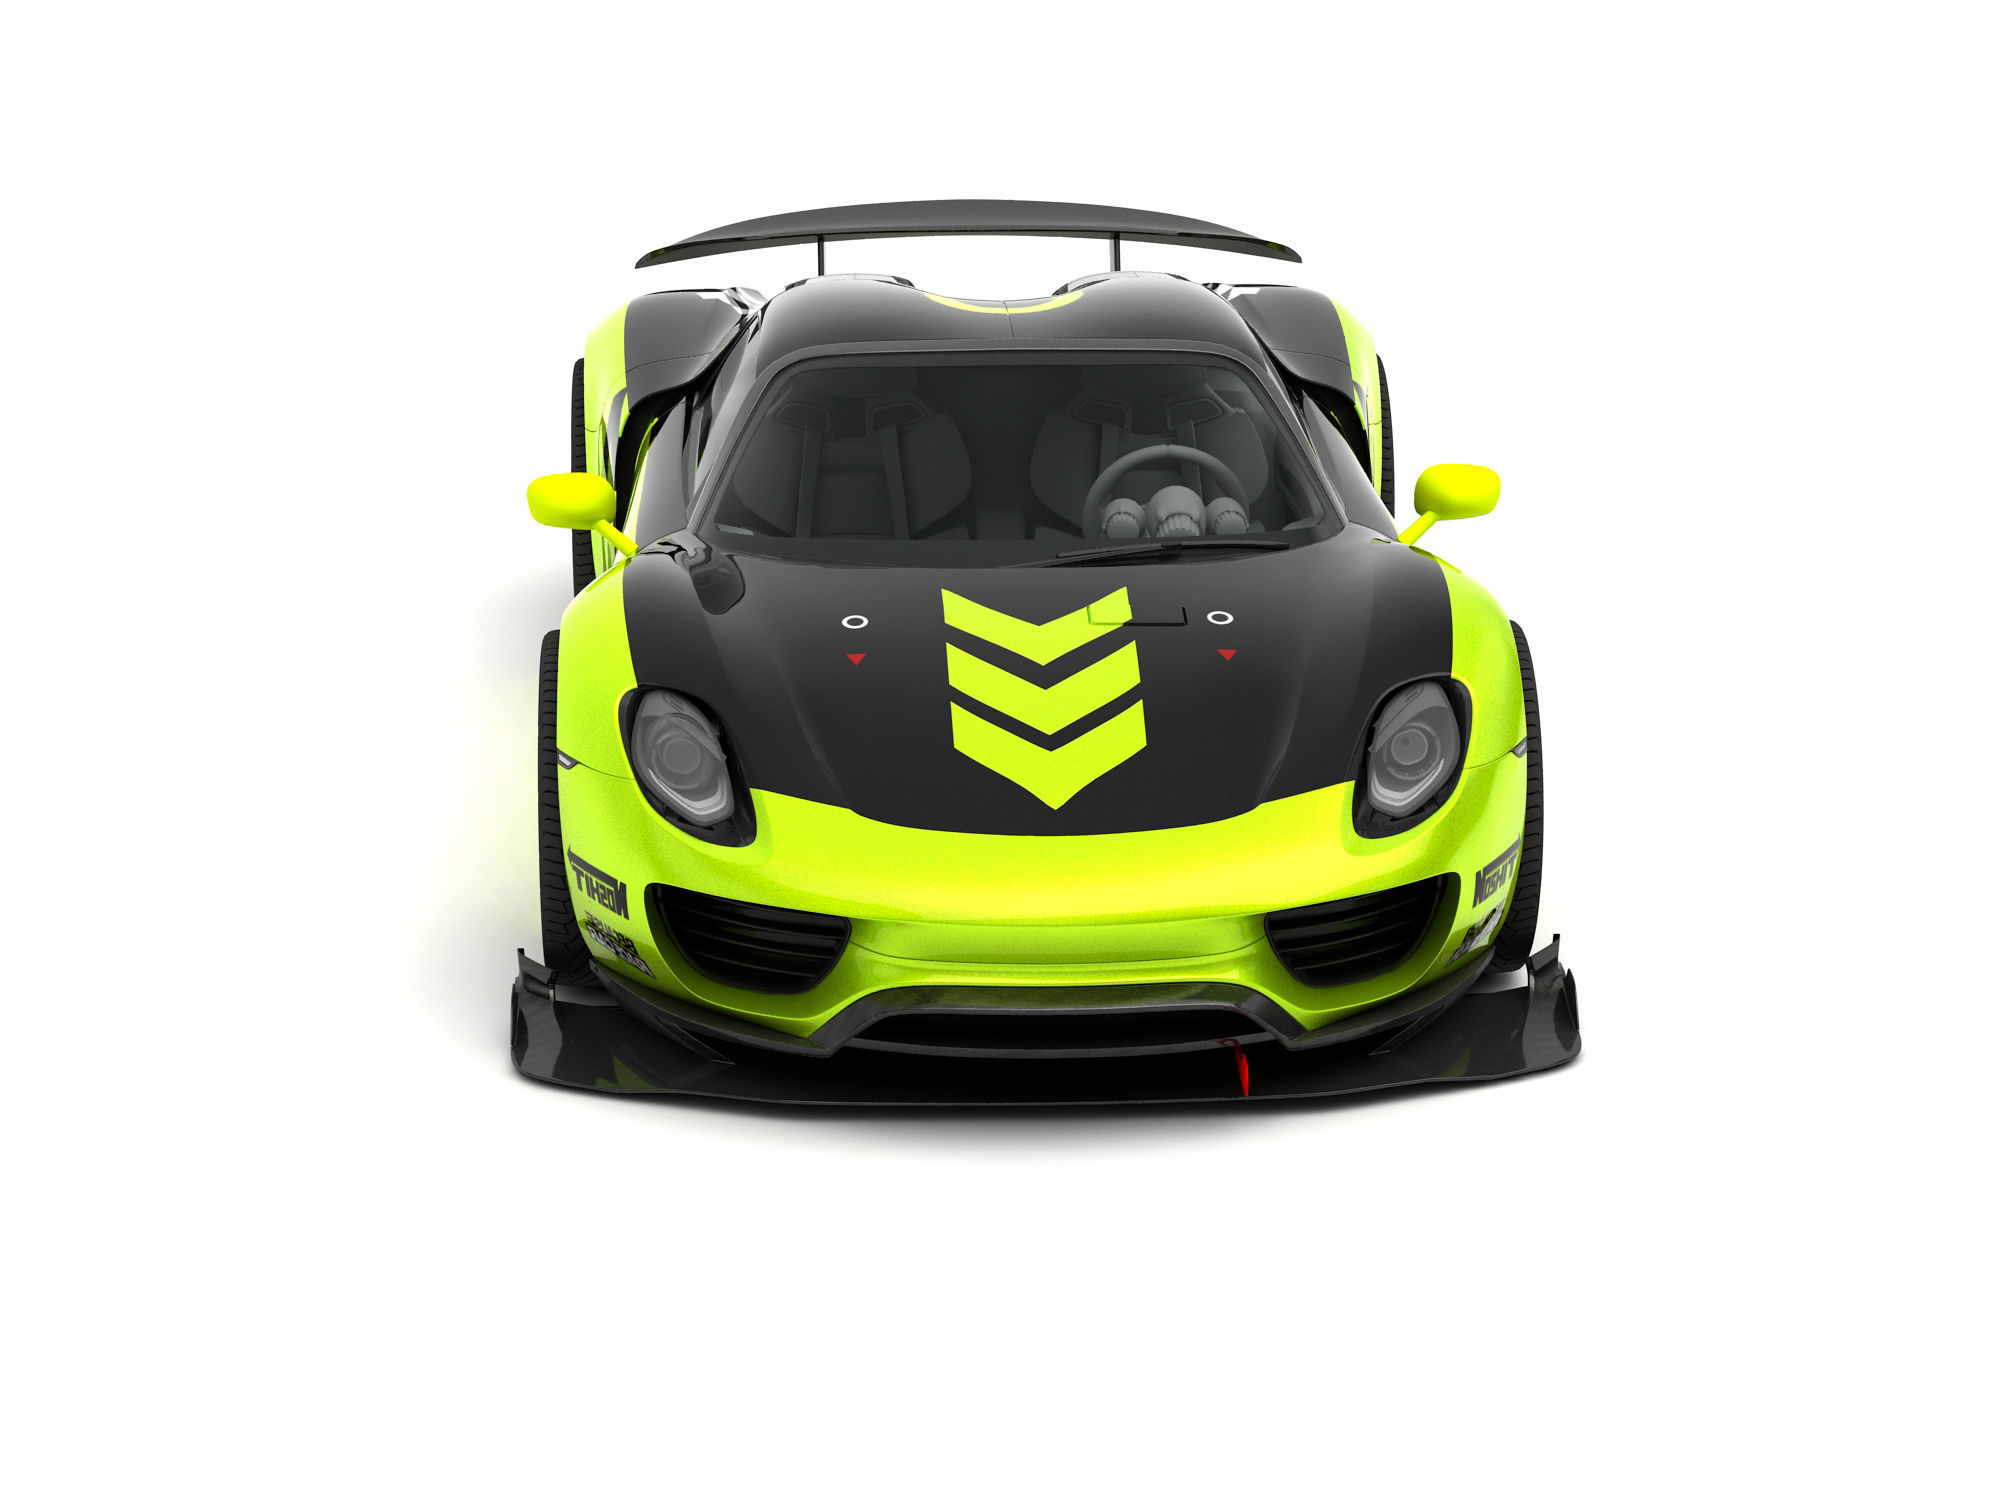 Chimera One Porsche 918 Street Race Concept Free 3d Models